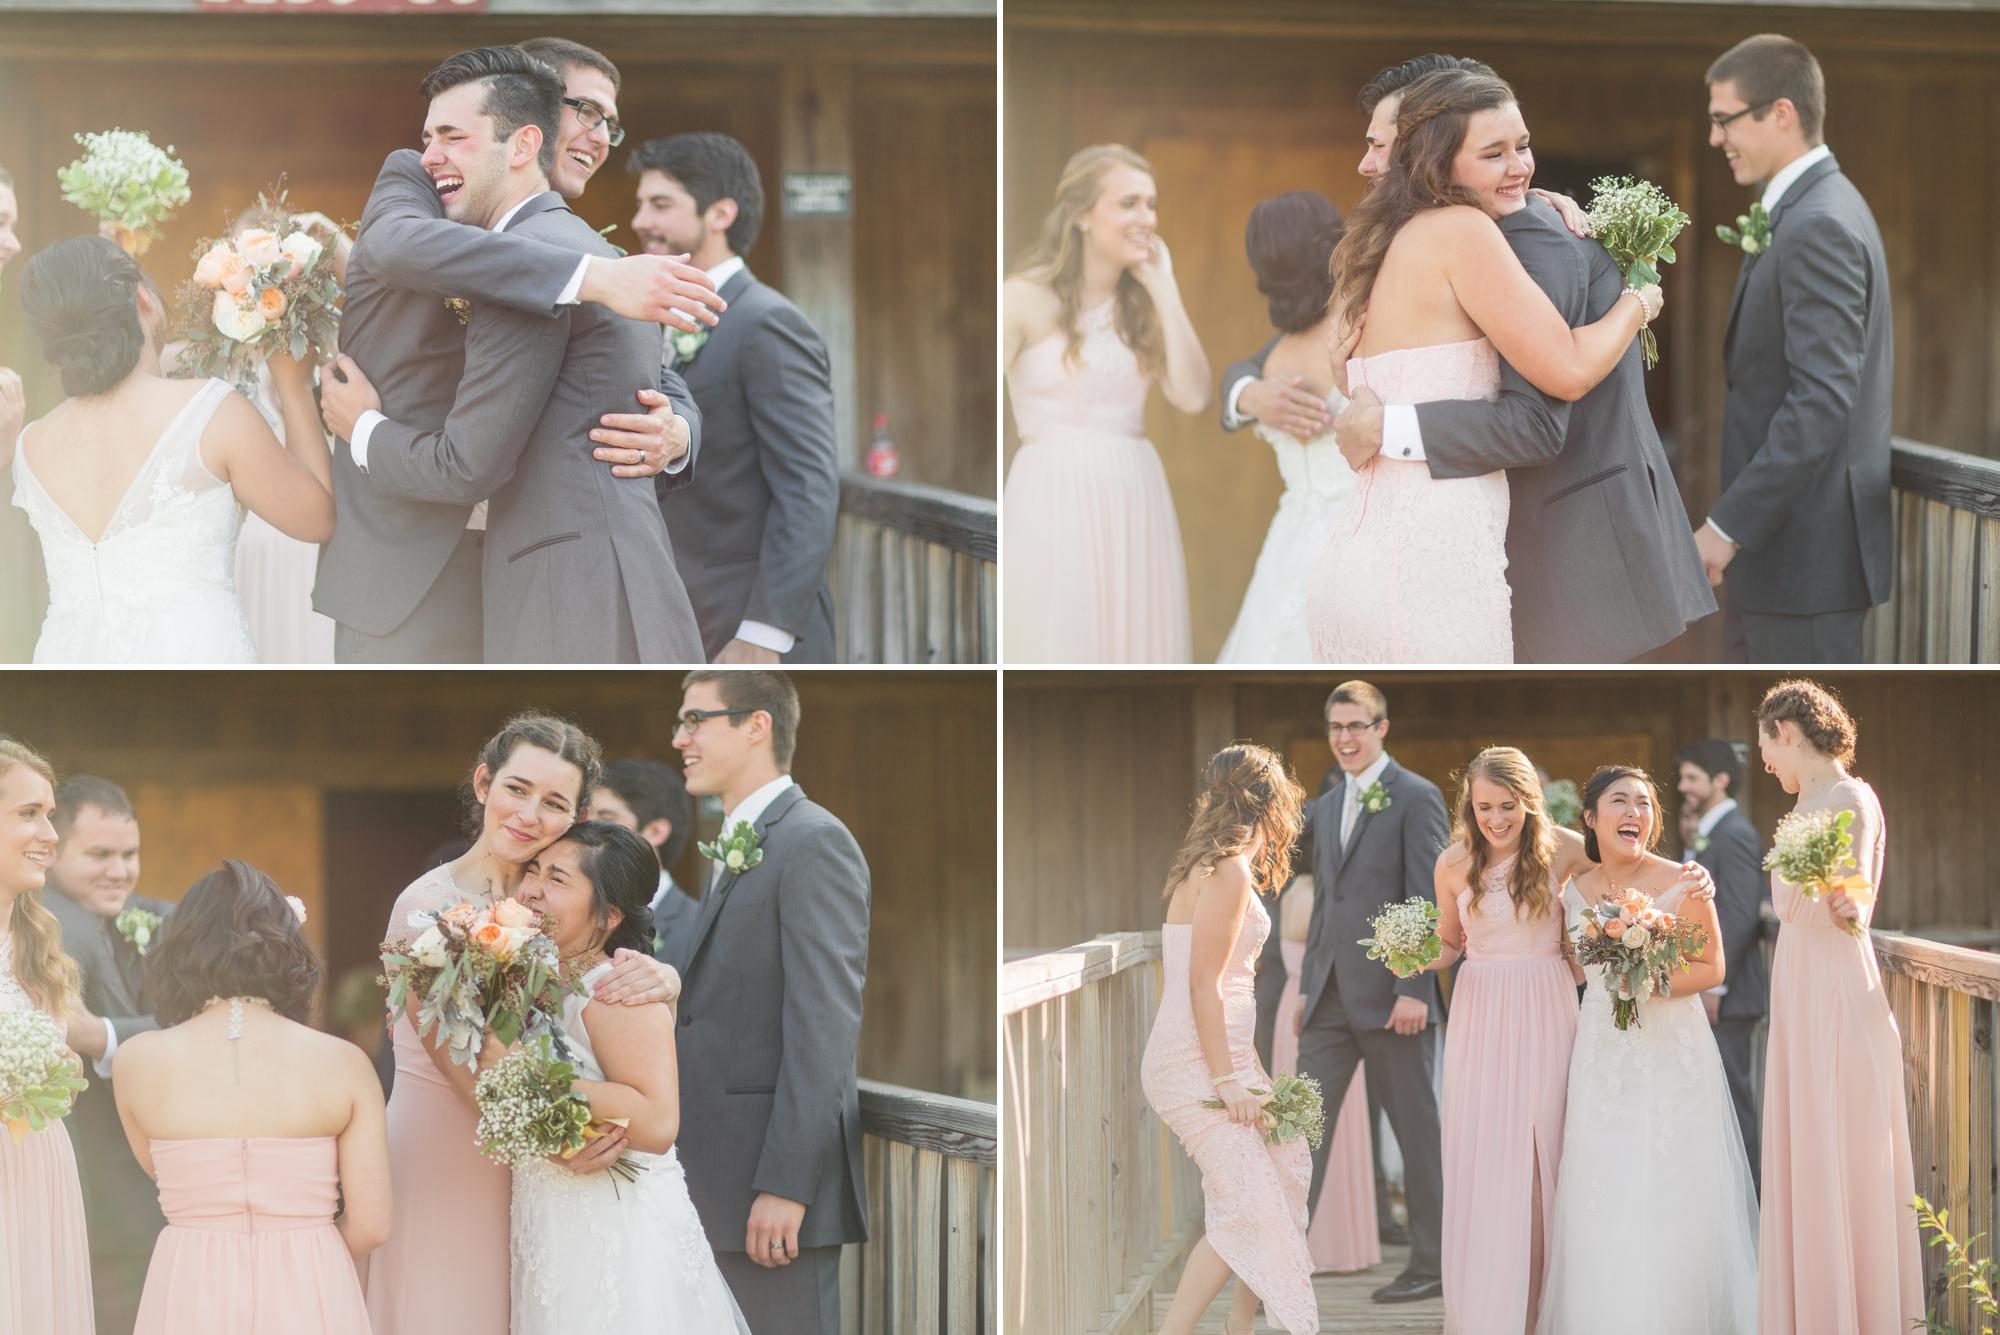 giles wedding blog 26.jpg